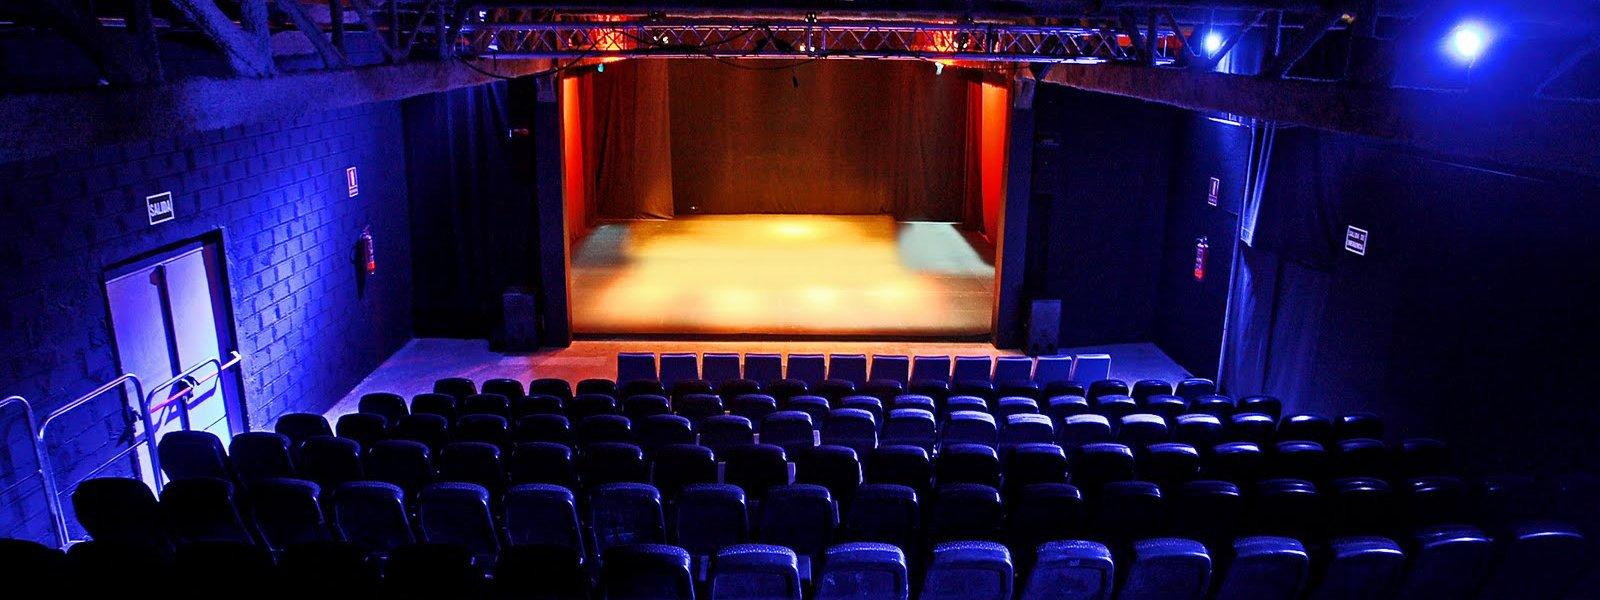 Sala Russafa, venue for shows representation